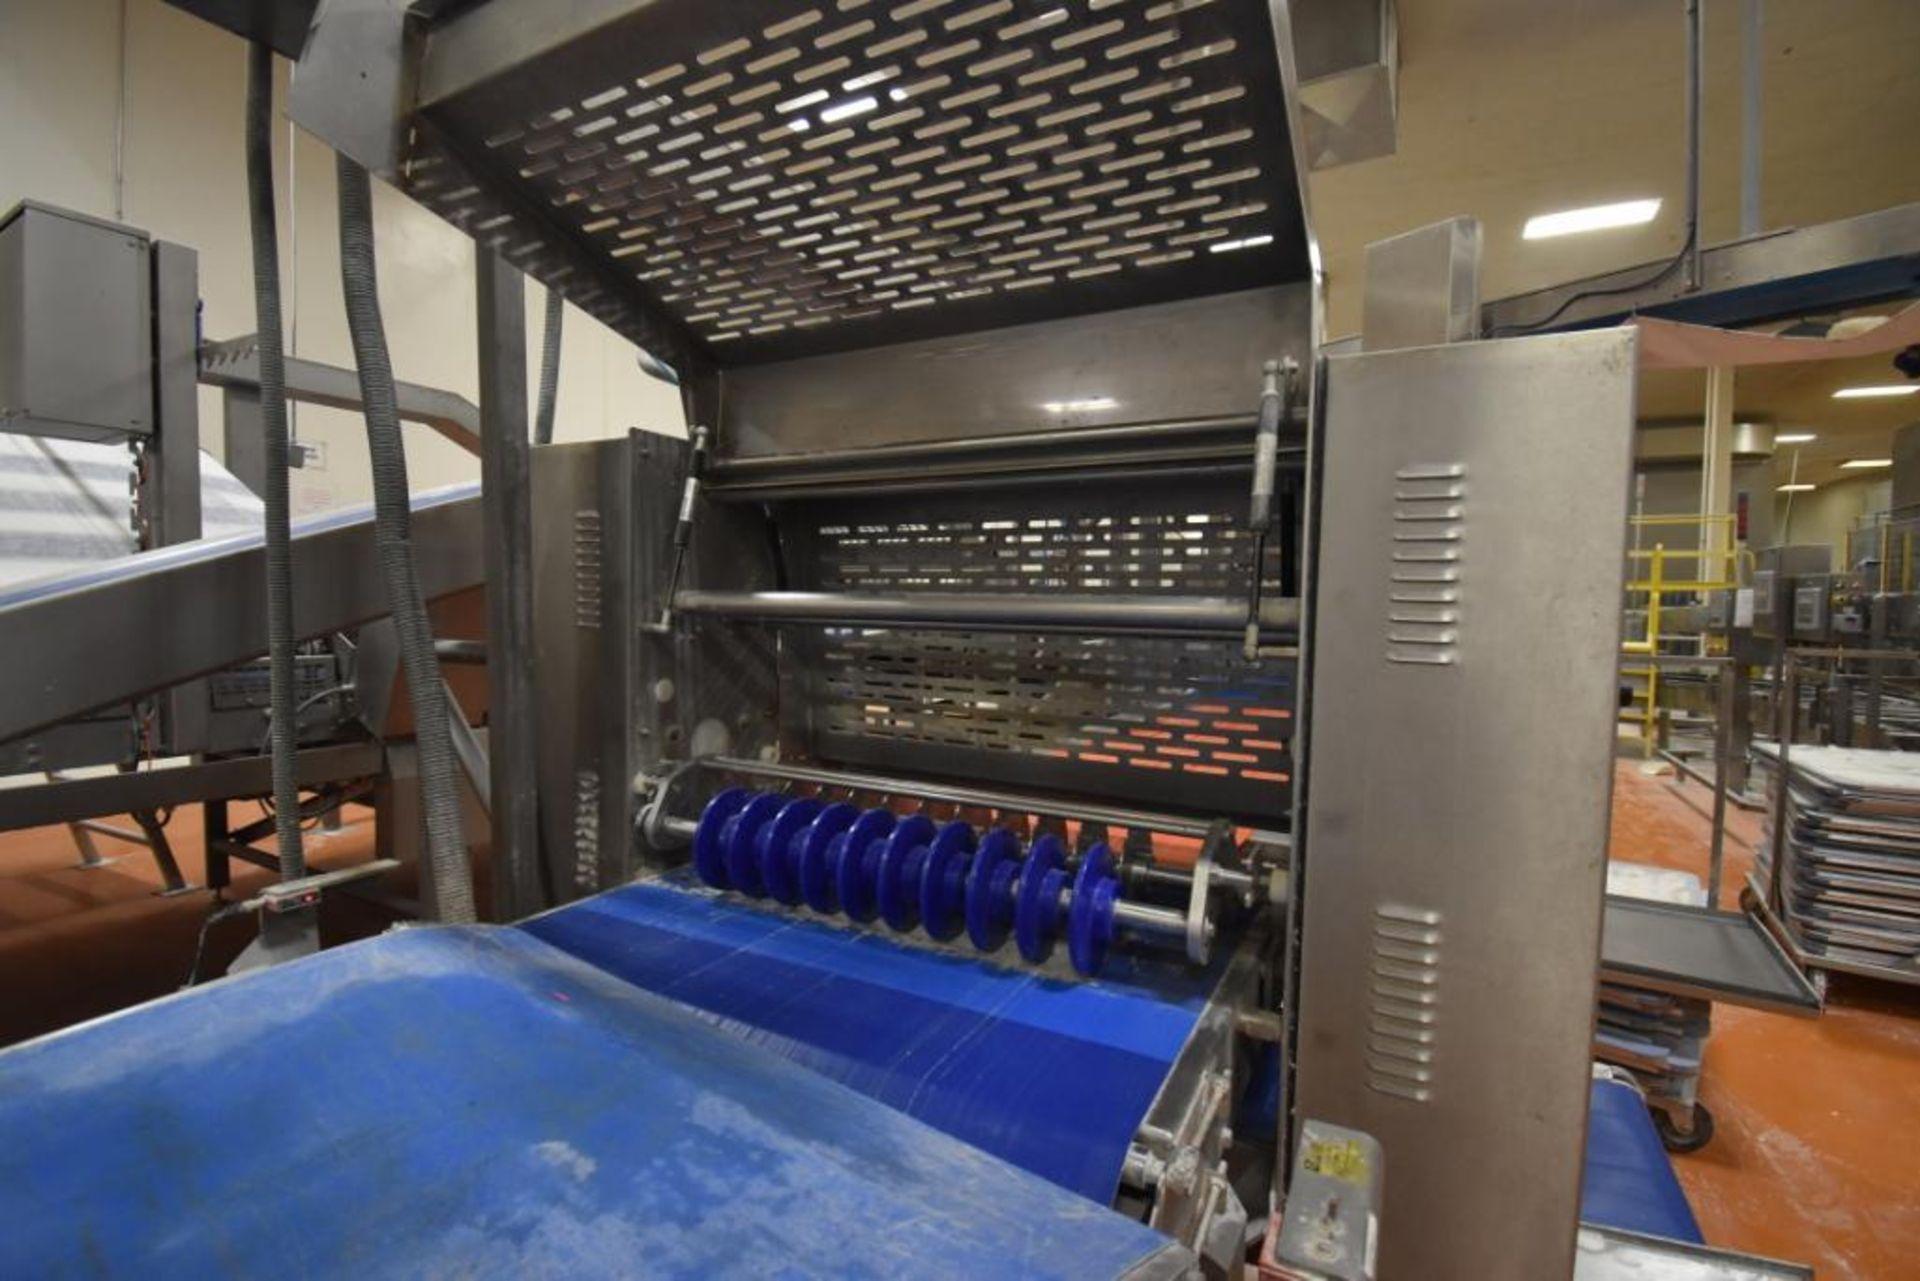 2007 Fritsch Laminator 3000 dough line - Image 96 of 280